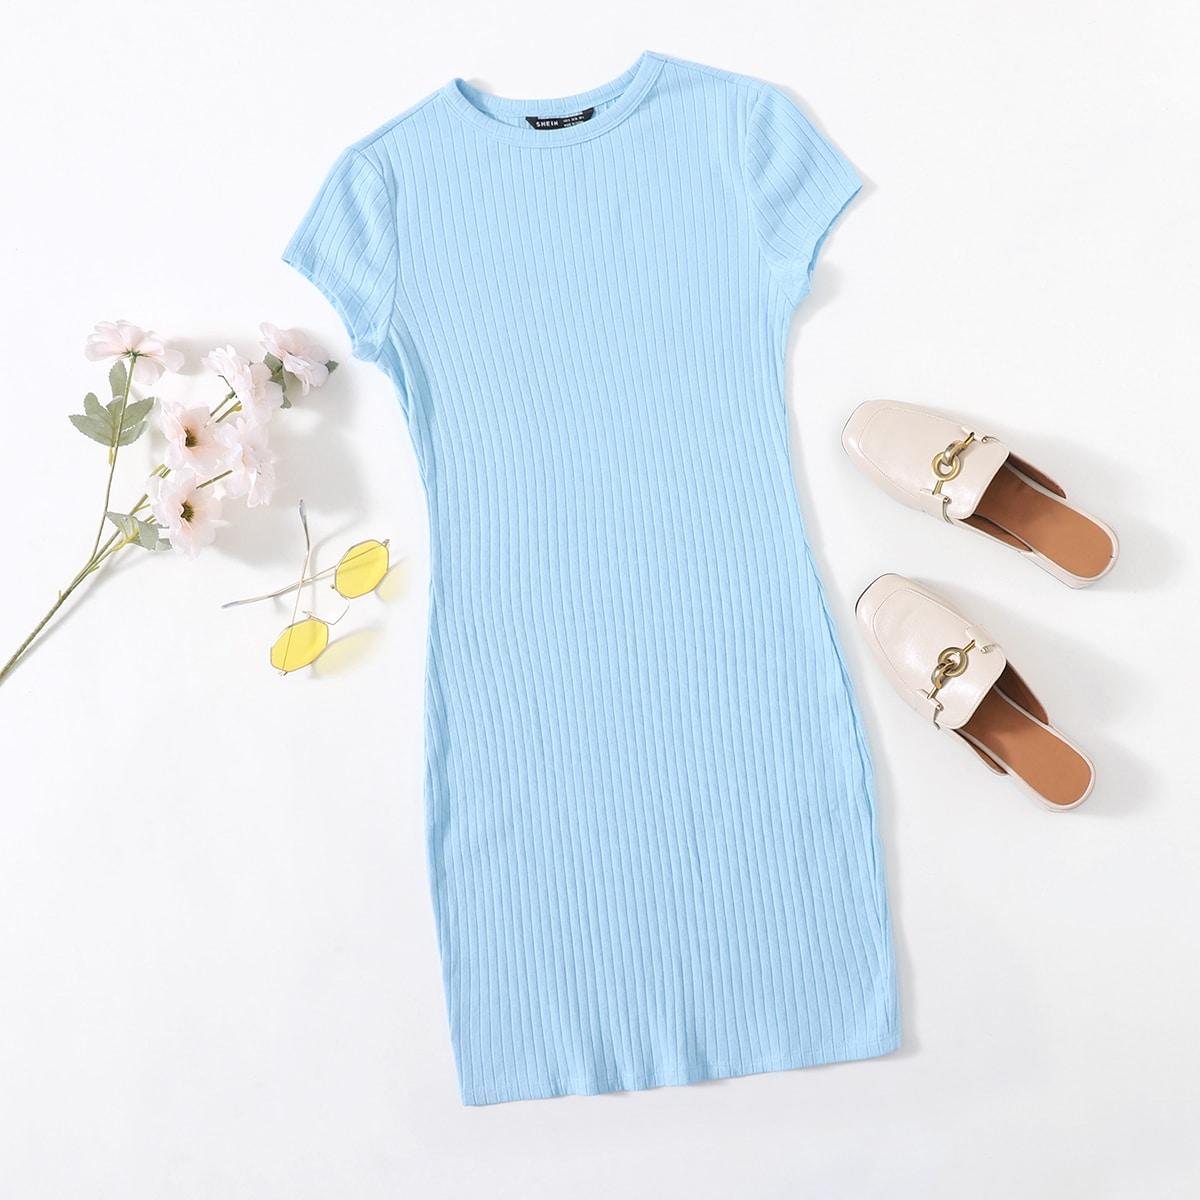 Вязаное платье в рубчик SheIn swdress07210122576